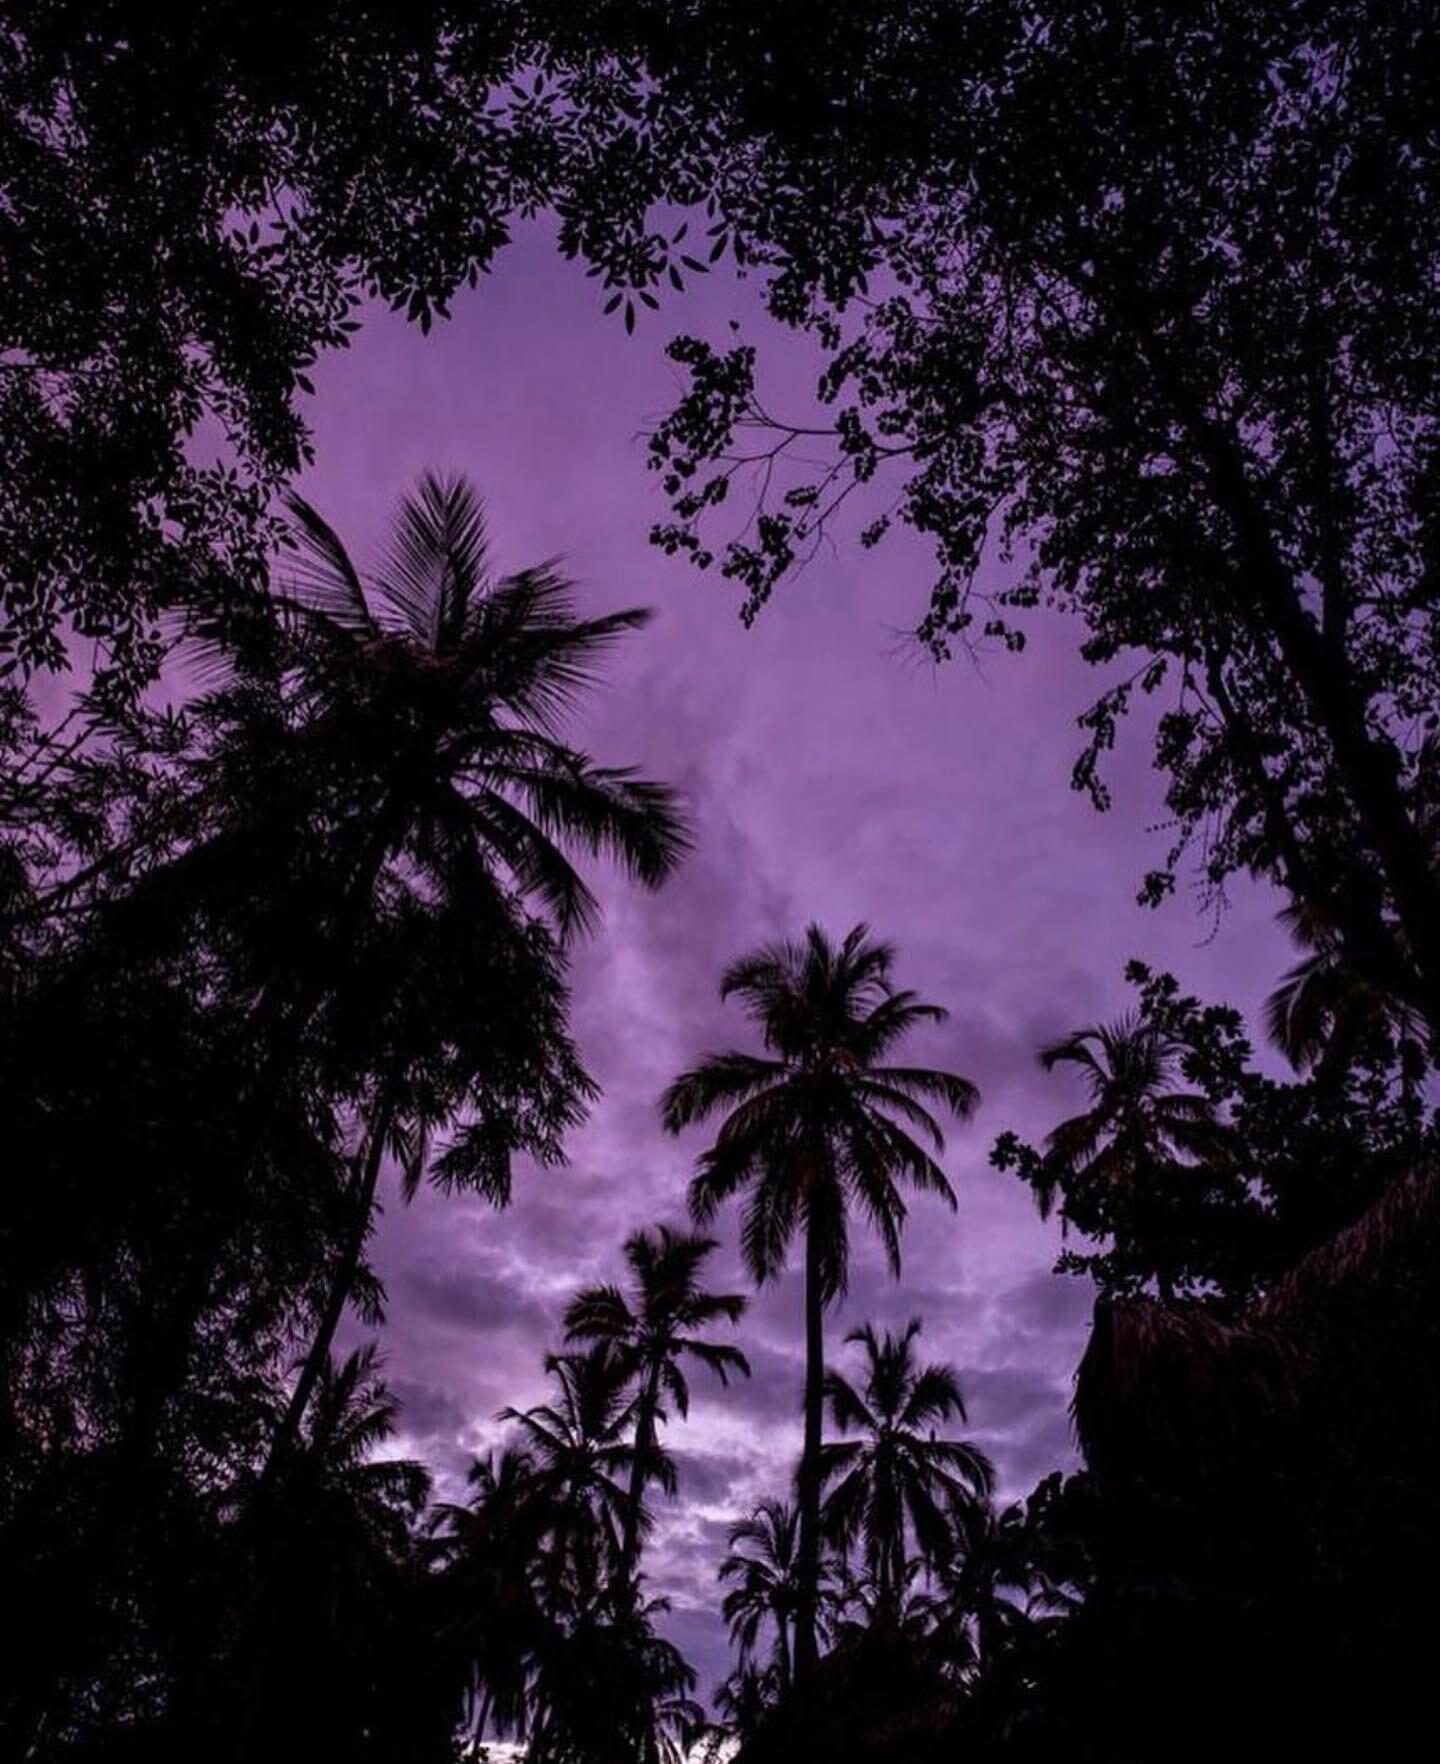 It's not what you look at that matters, it's what you see ✨ ~ Henry David Thoreau  . . 📸 @cristinawarner  #gitanadelmar #eveningdusk #tropicalskies #caribesutil #naturelovers #naturalparadise #corazondelmundo #sierranevadadesantamarta